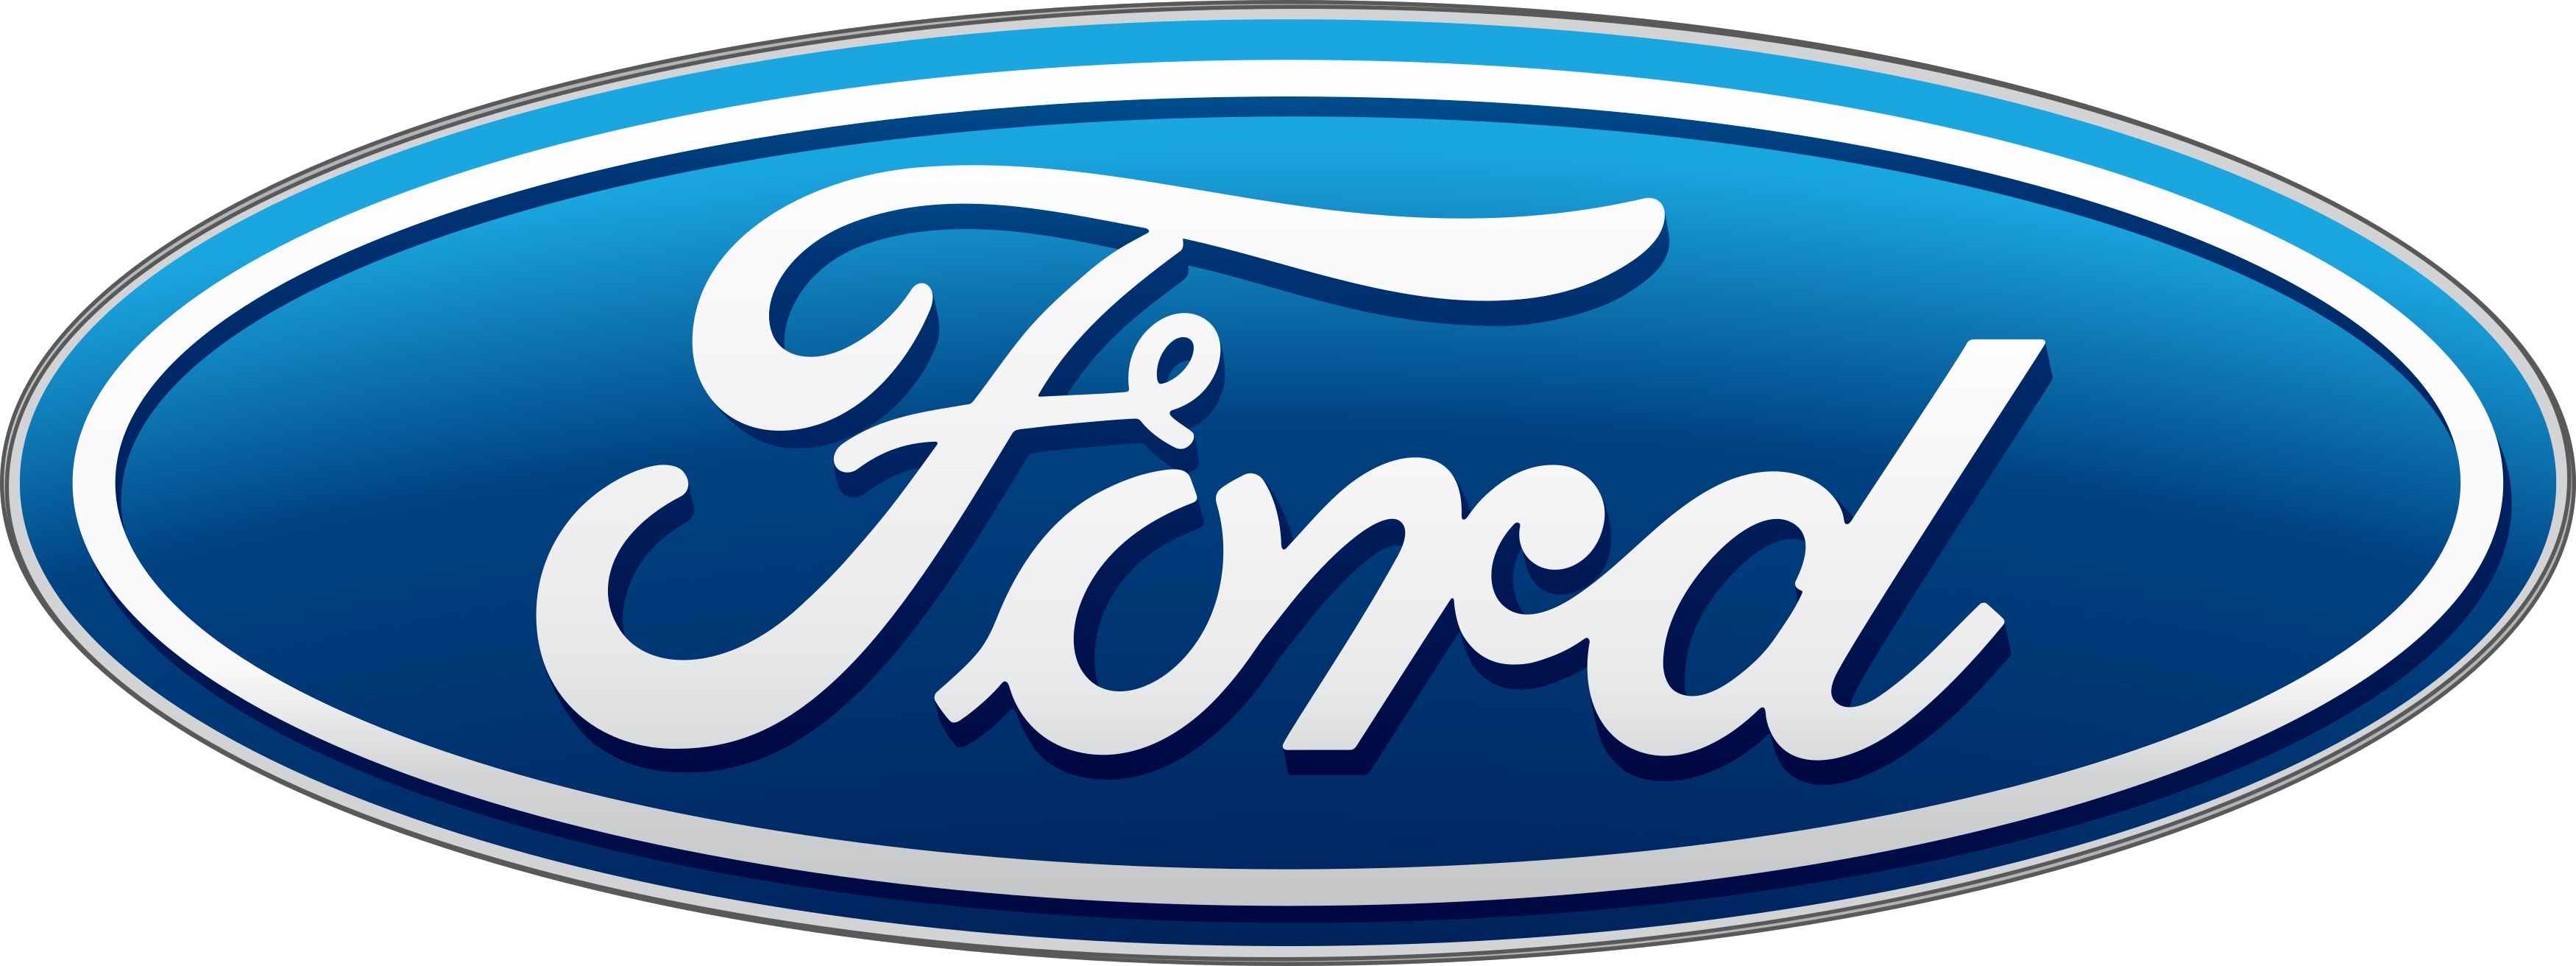 ford logo 1 - Ford Logo